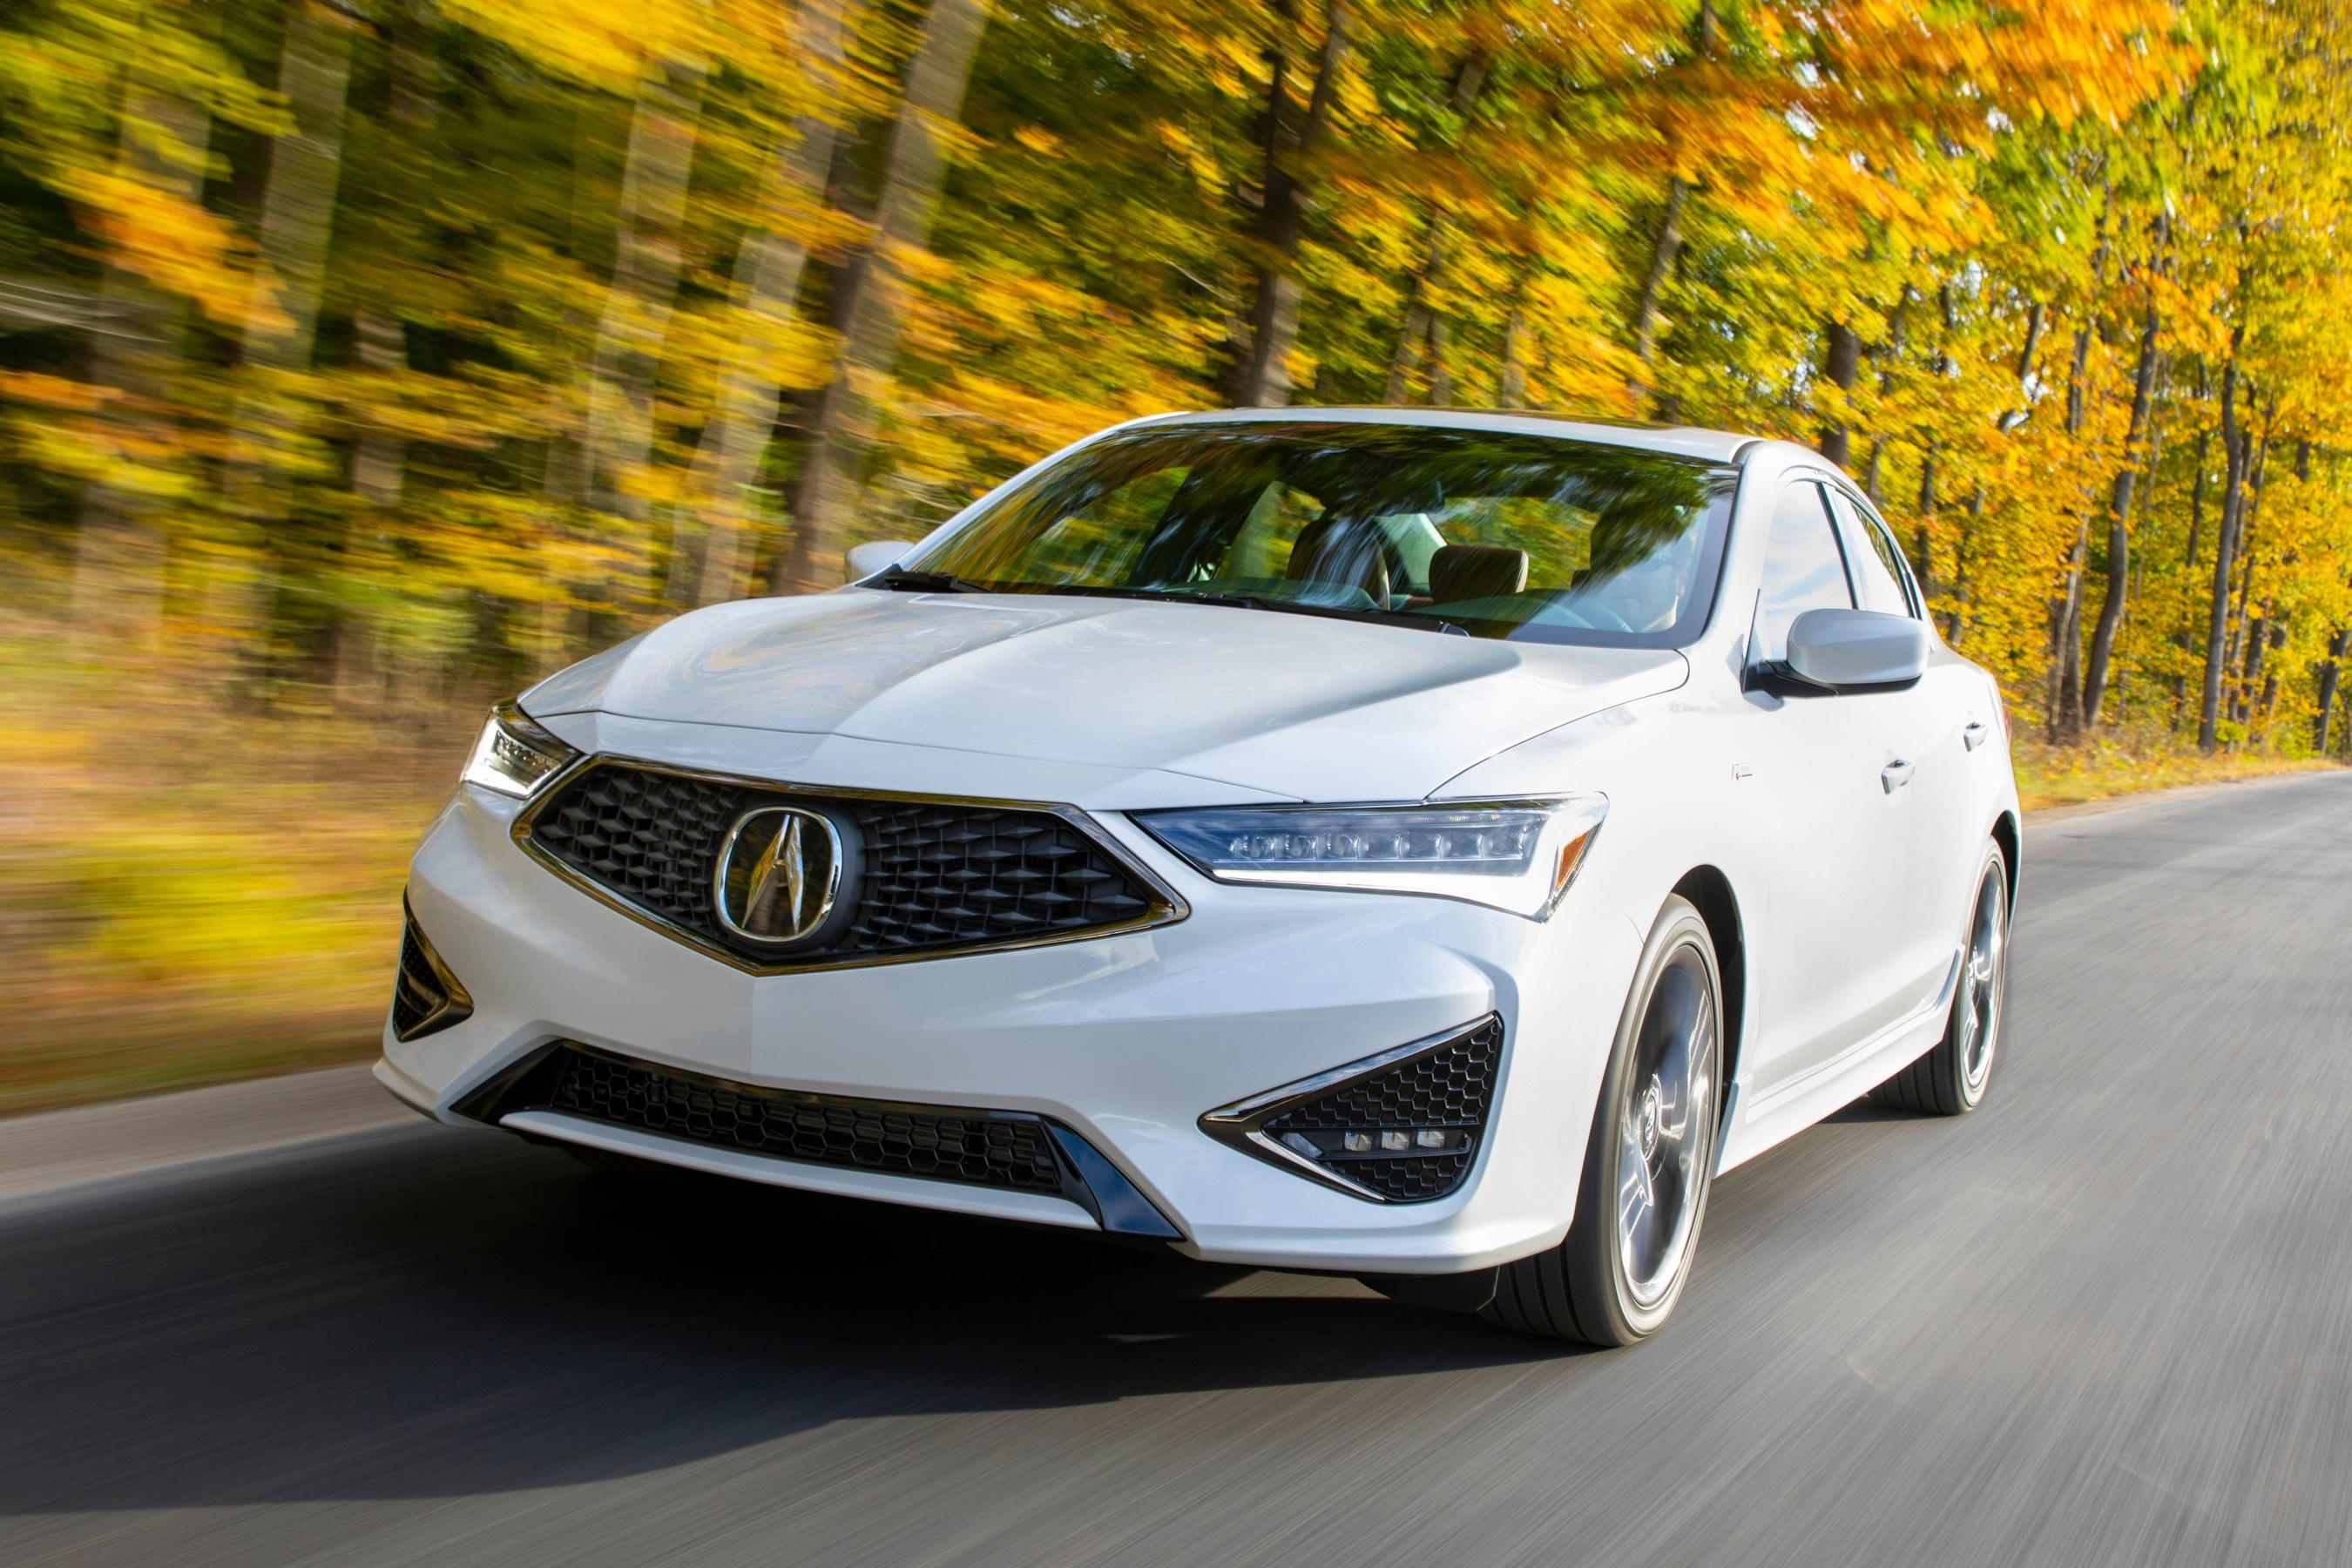 2020 Acura ILX New Concept